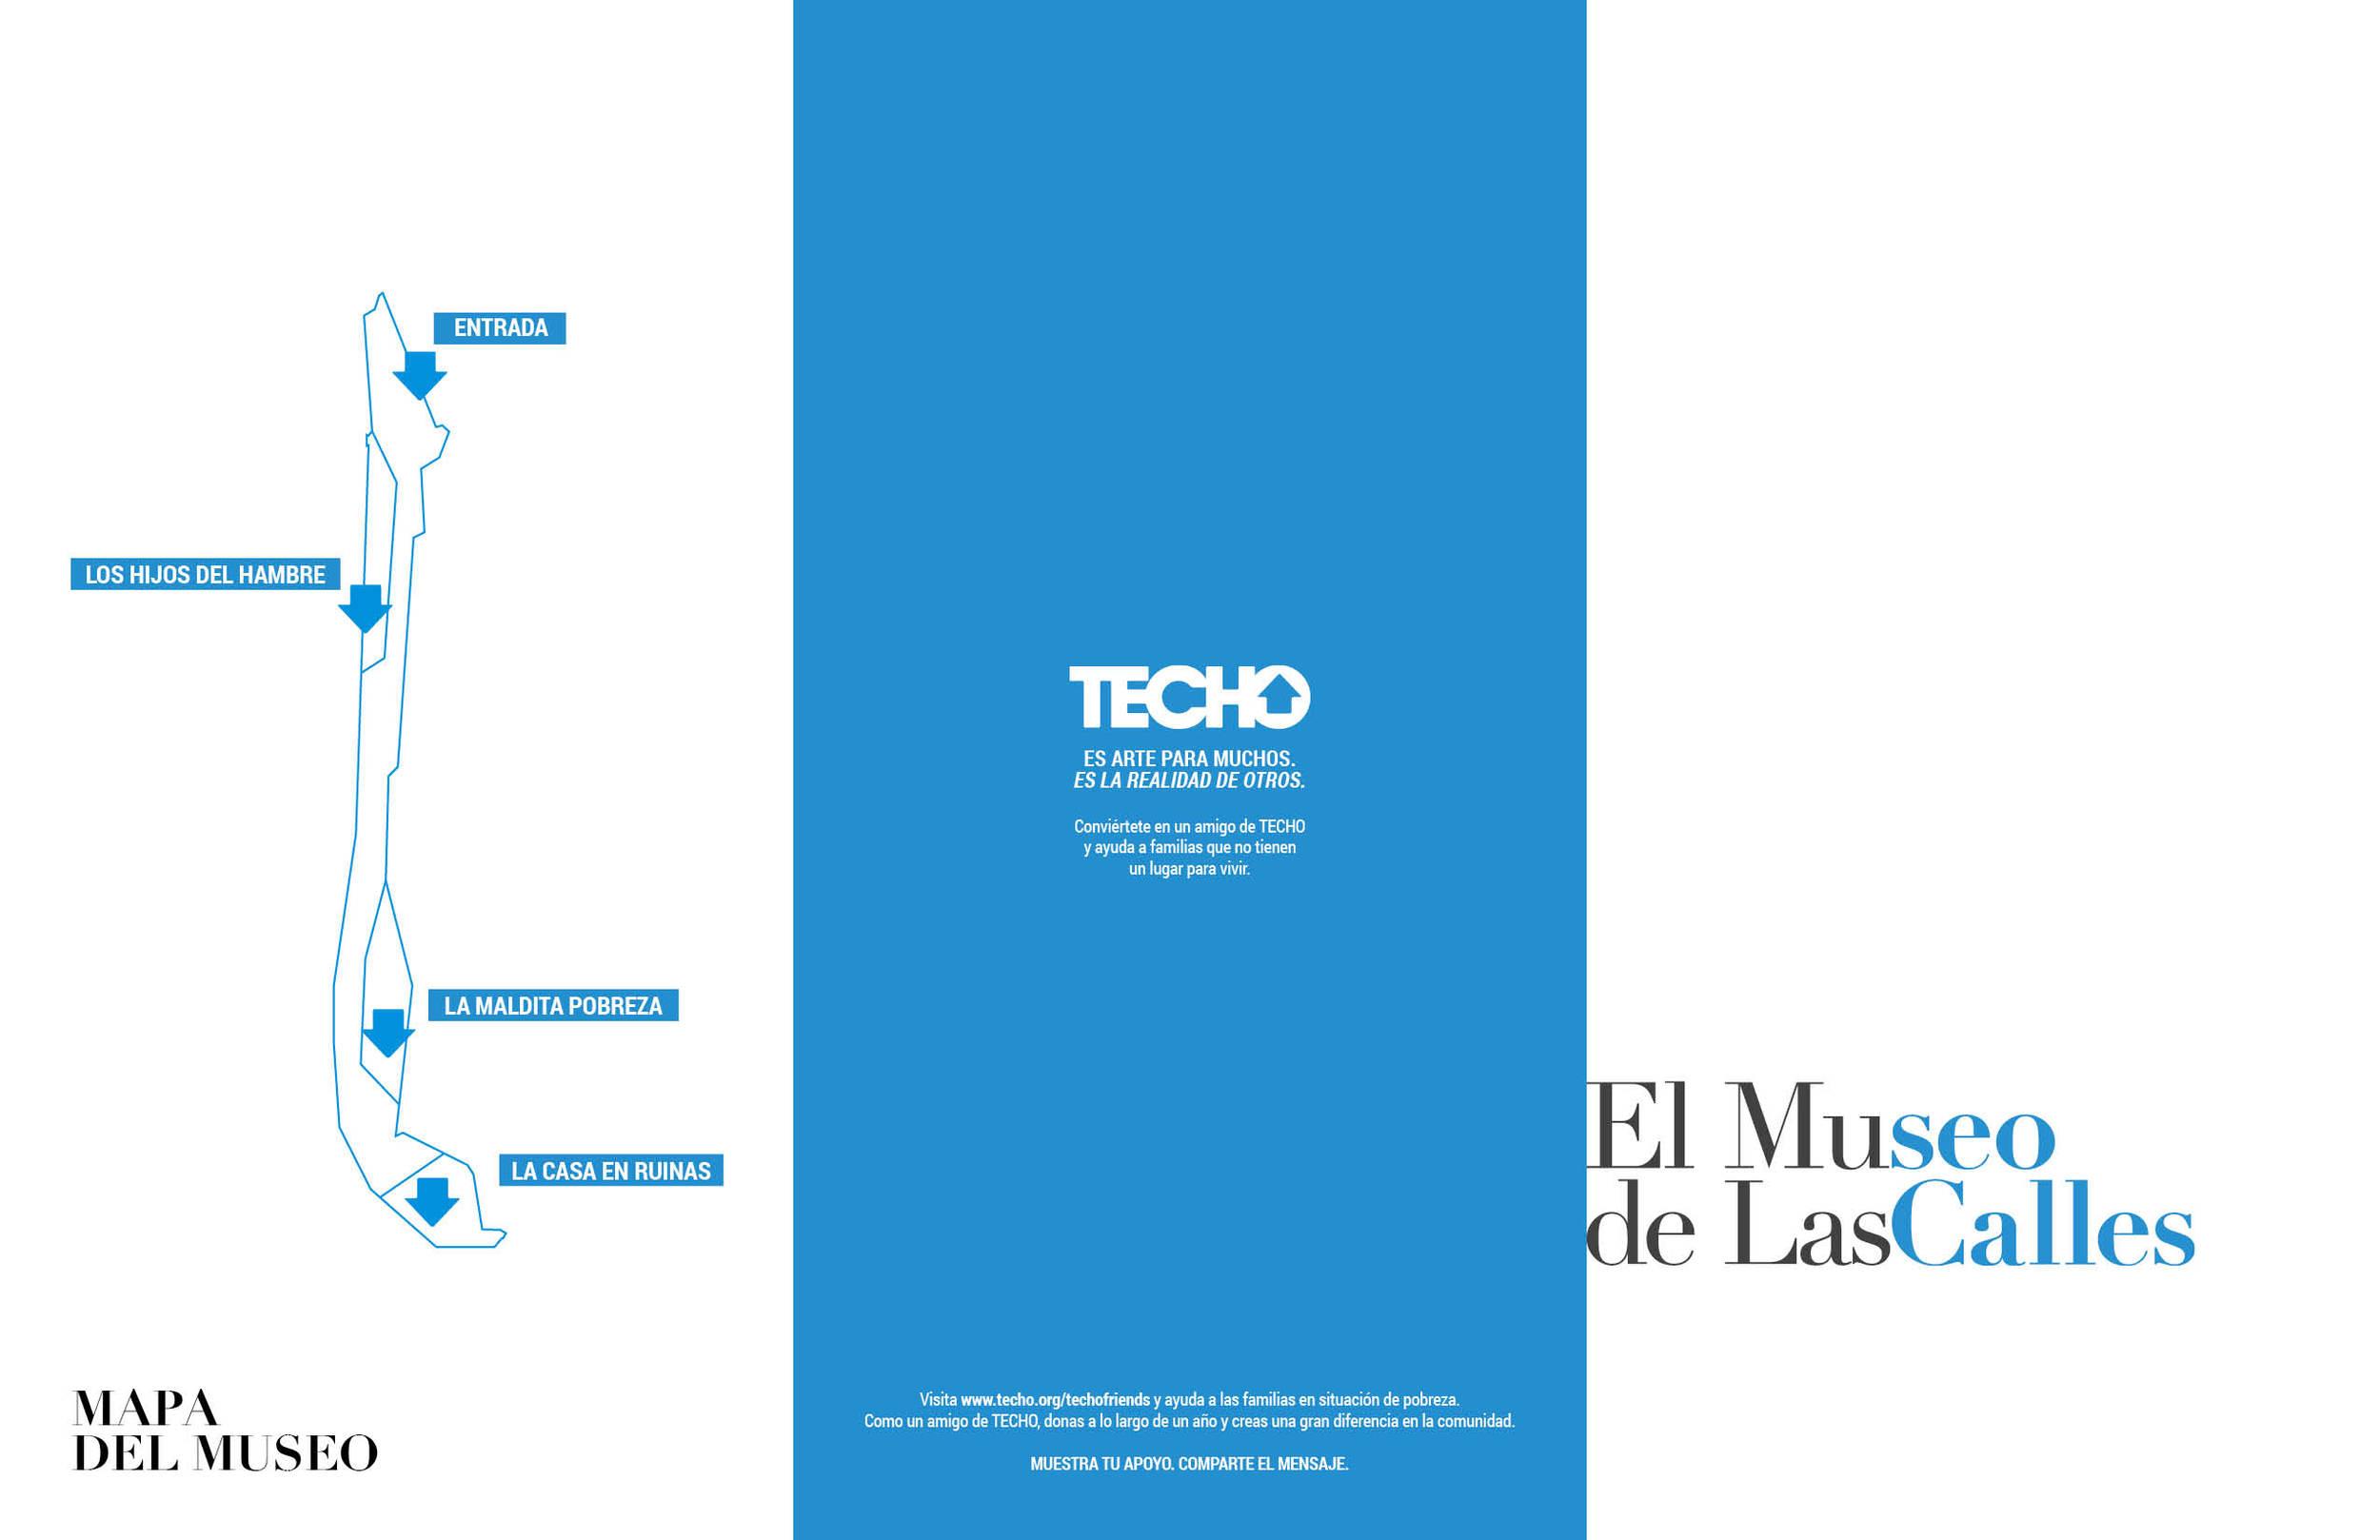 techo_MDLC_folleto.jpg